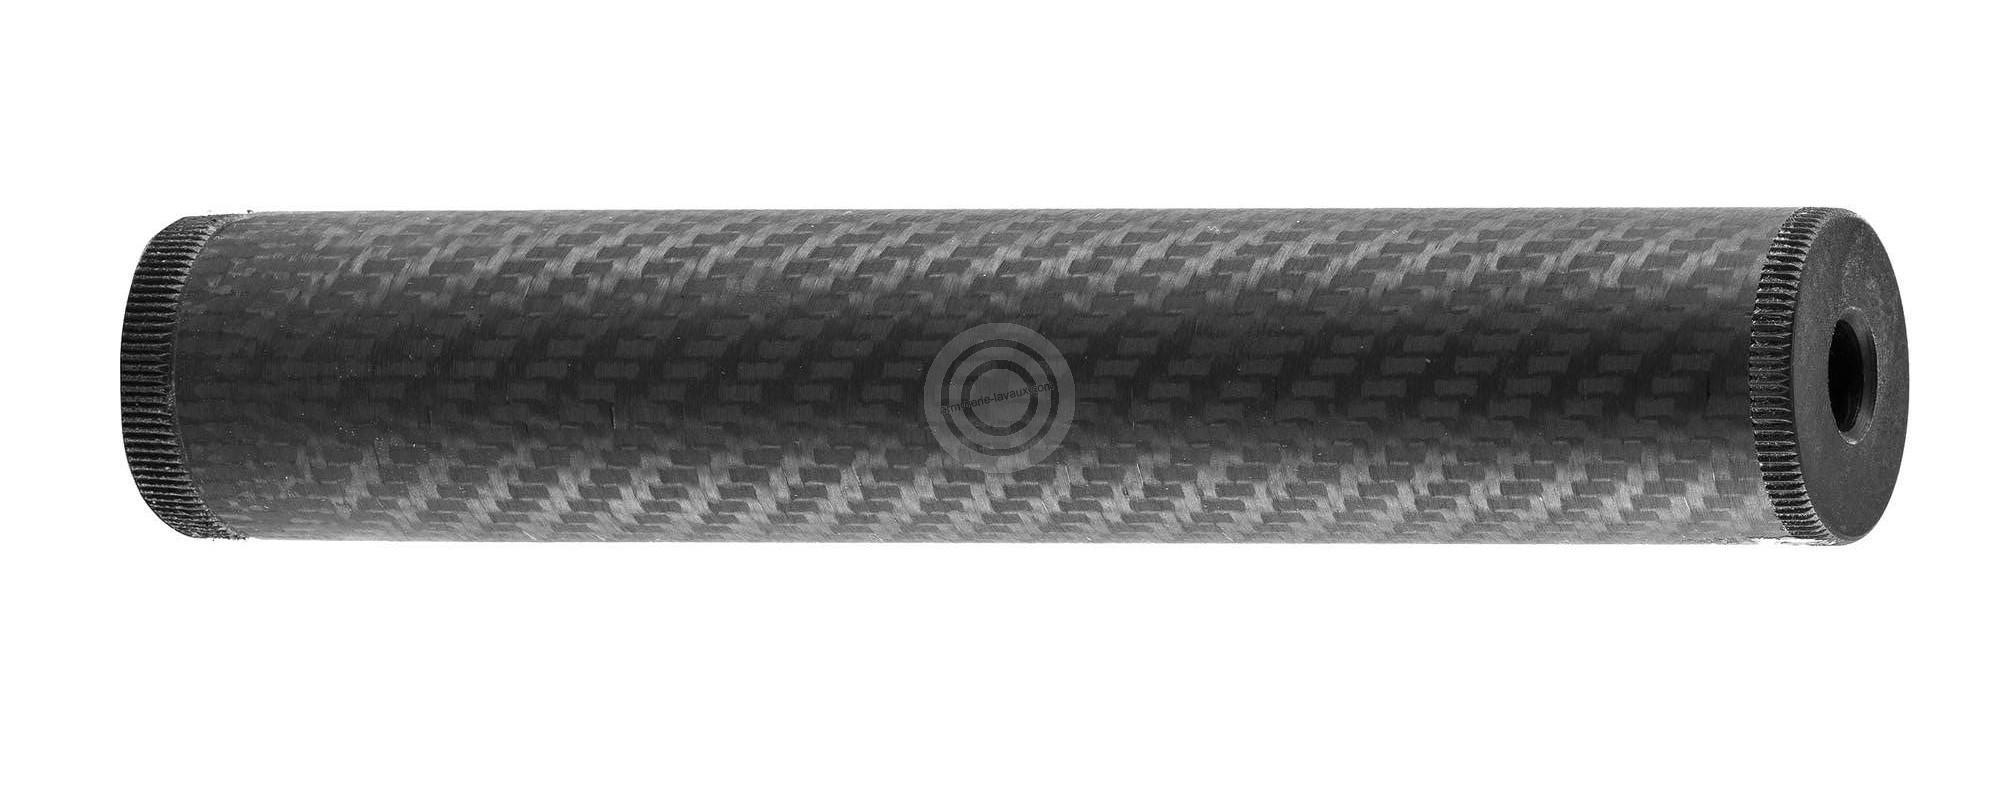 Silencieux 22lr carbone (Filetage 1/2x28)